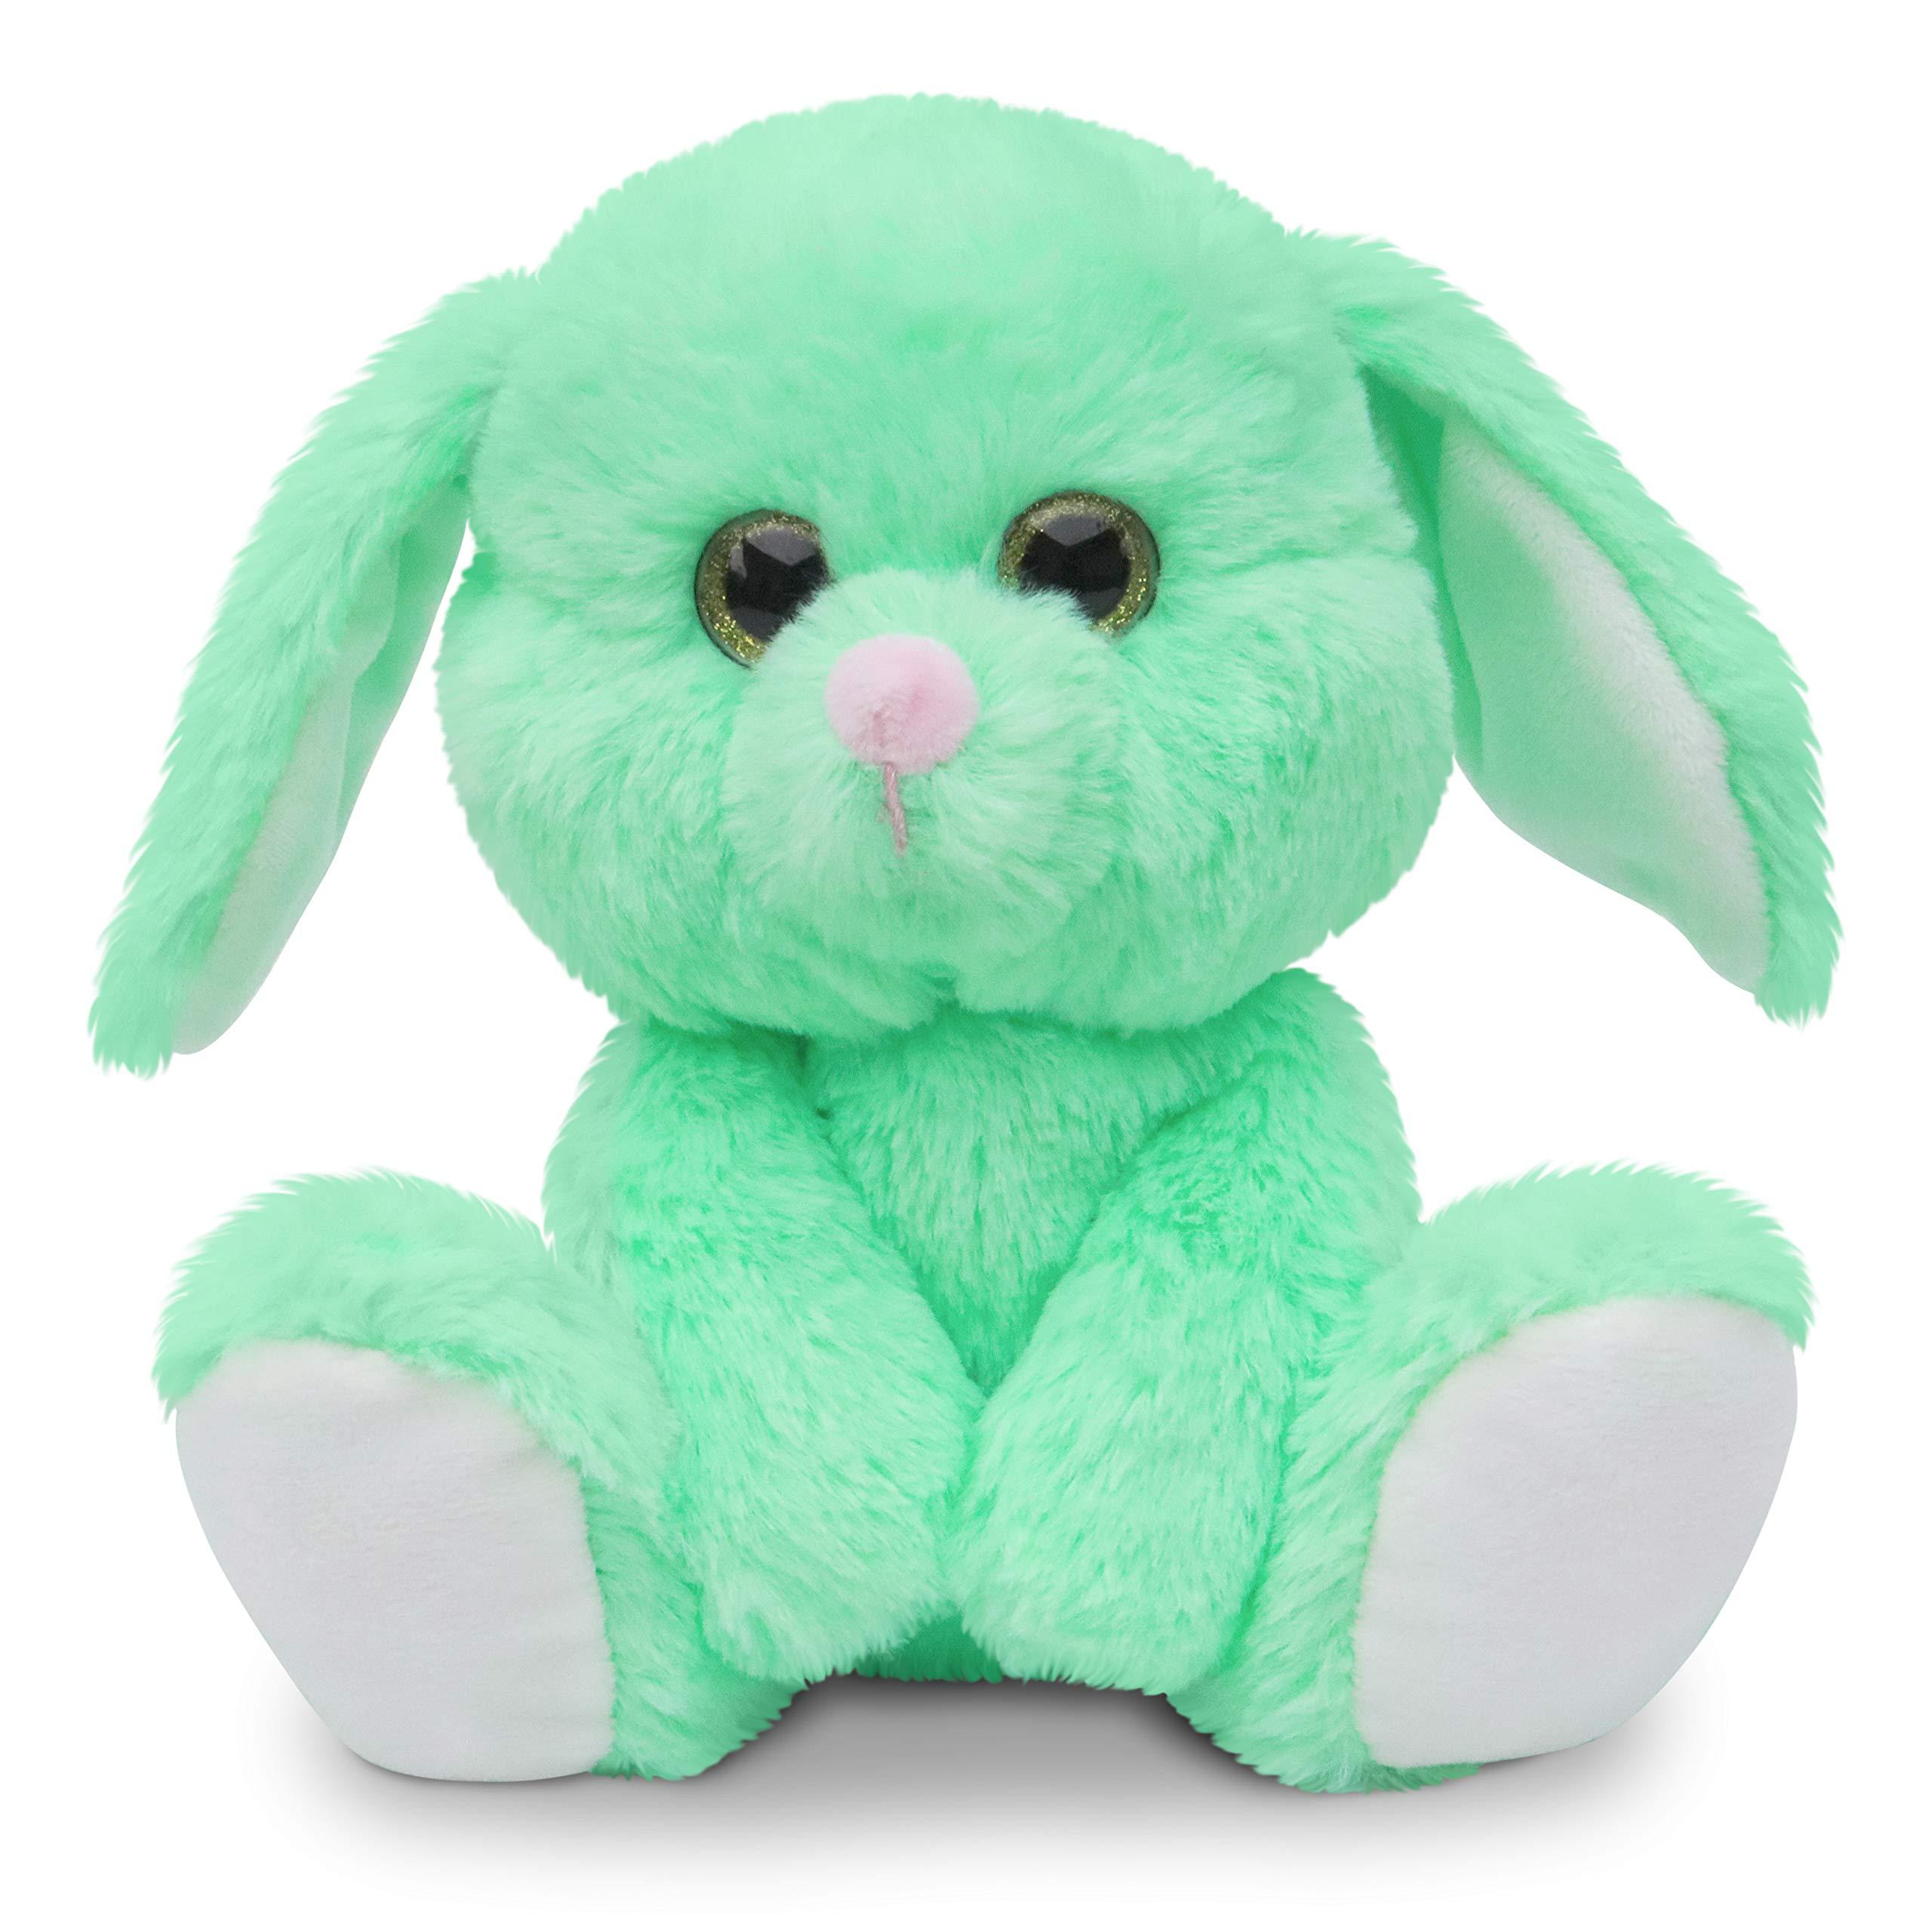 Fluffuns Bunny Stuffed Animals - Stuffed Bunny Plush Toys - 9 Inch Easter Bunny Rabbit Plushes (Green)